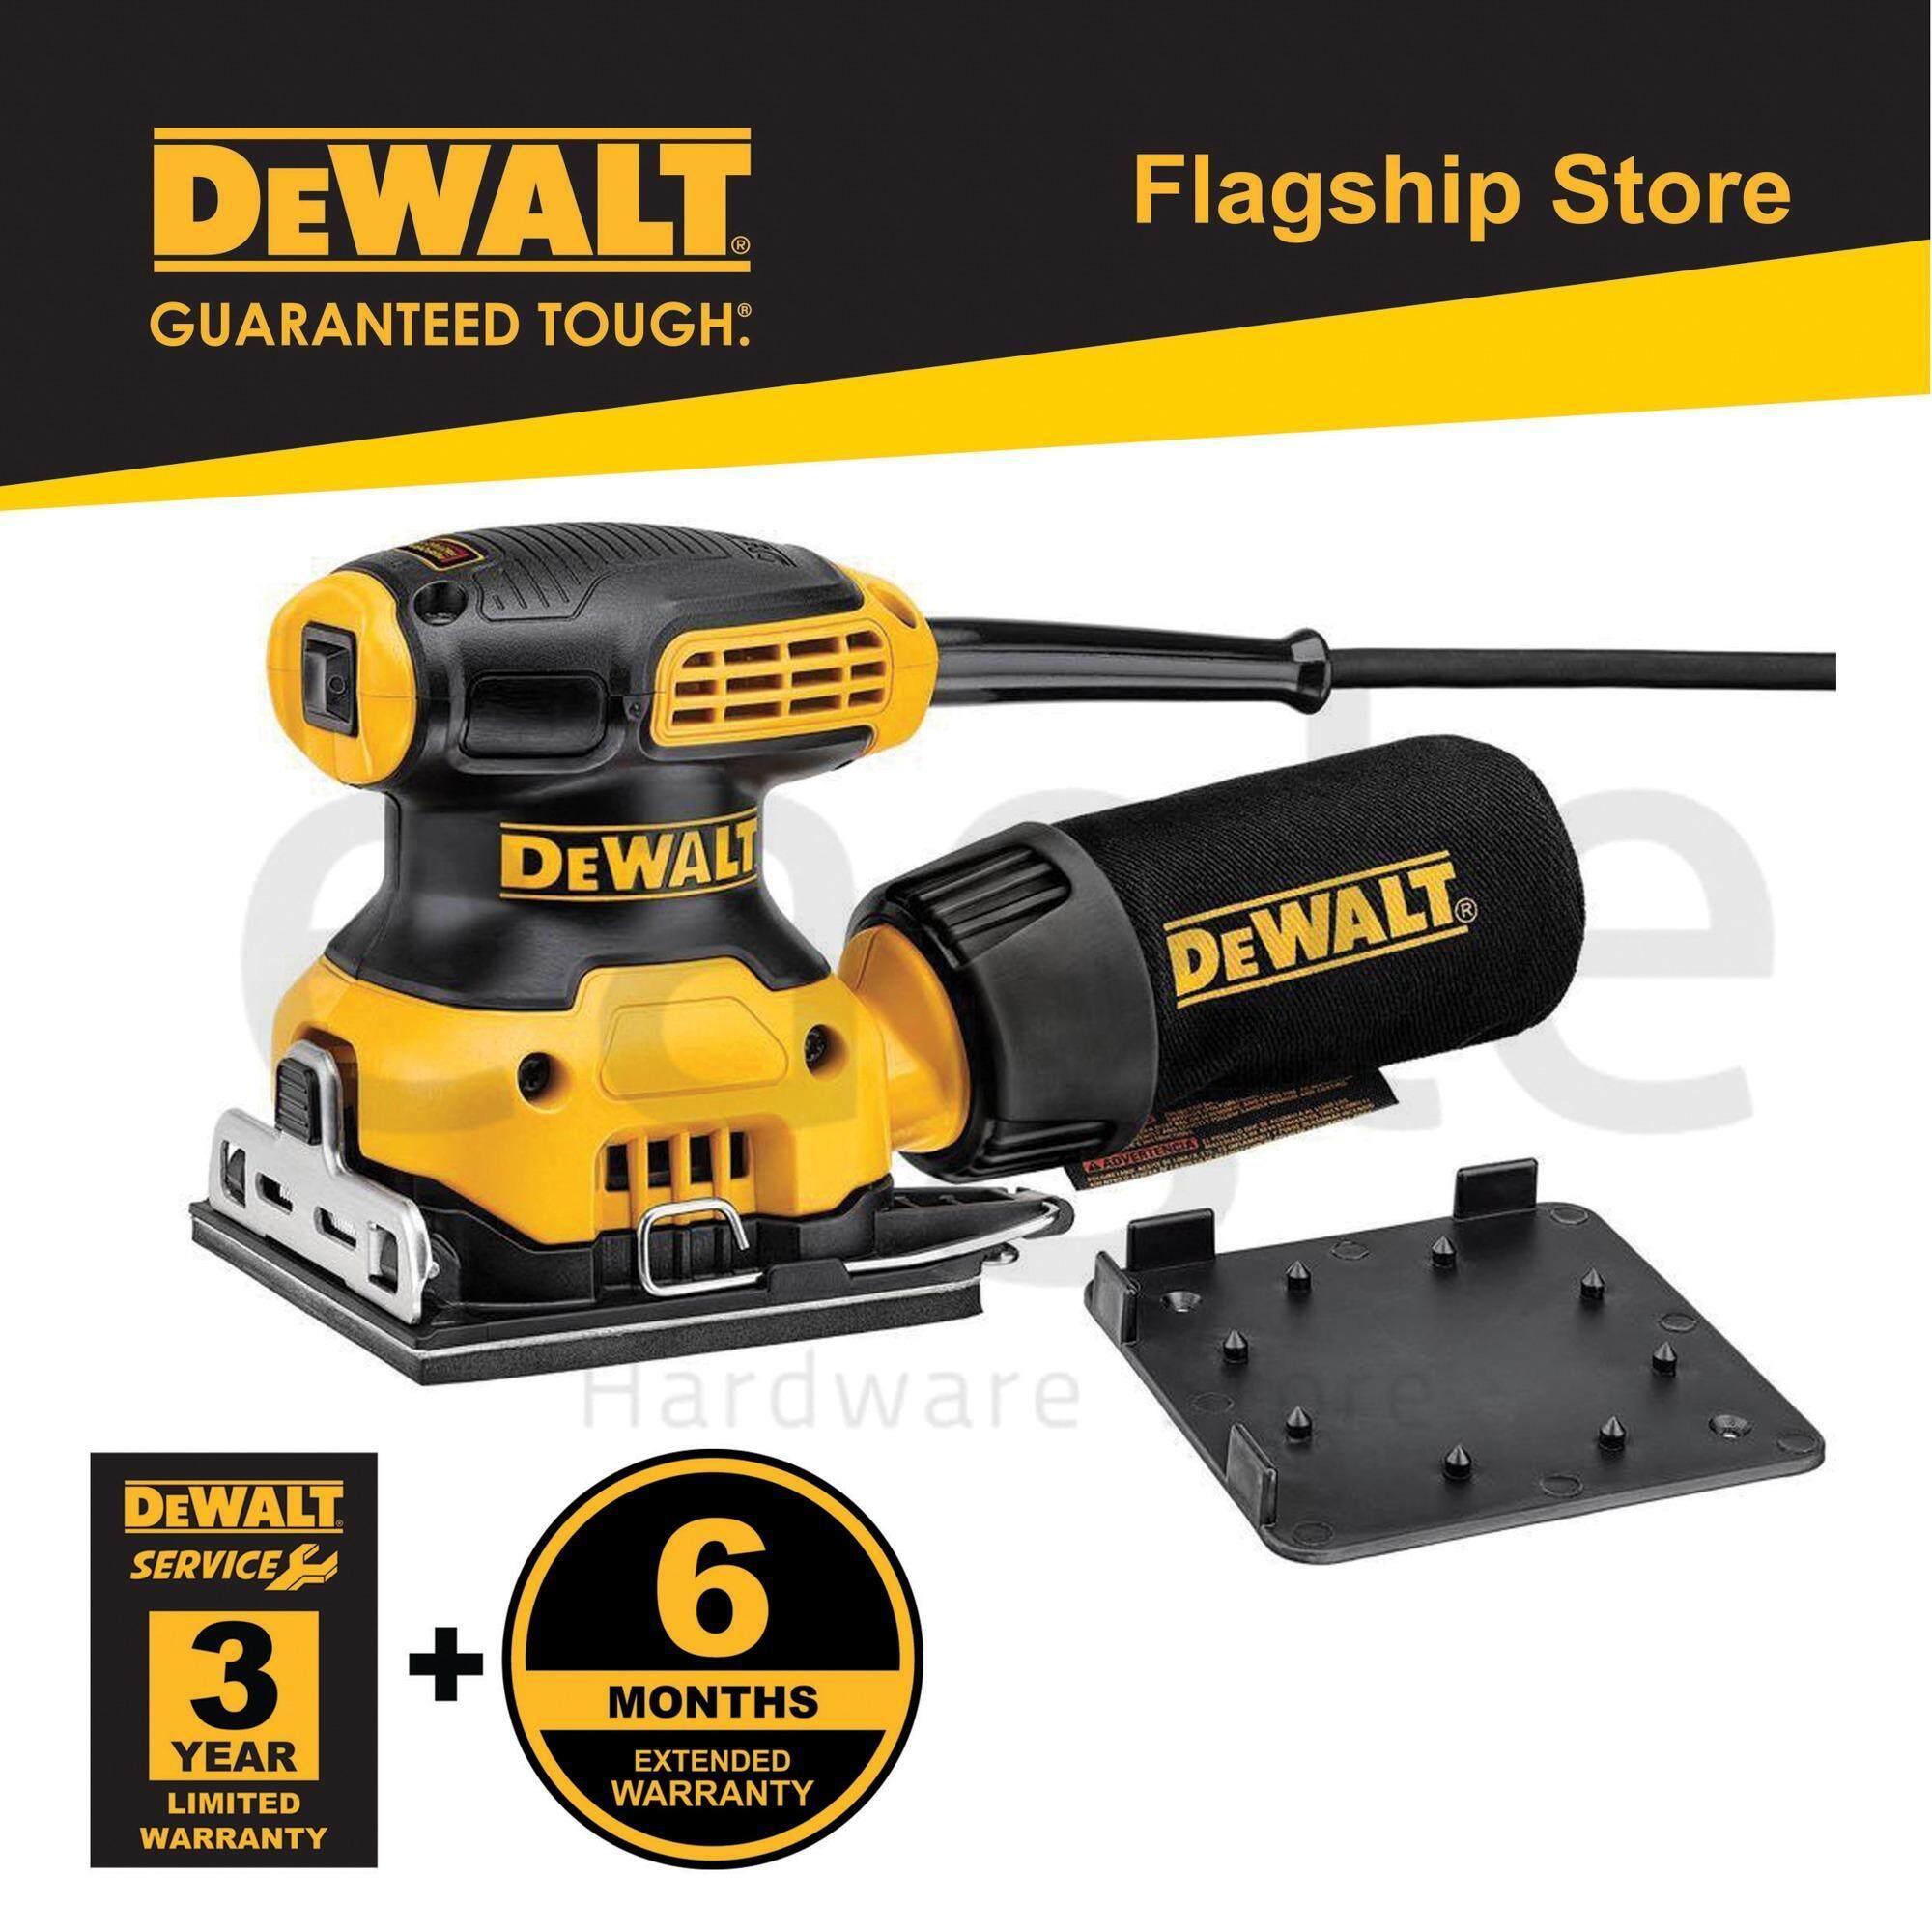 Dewalt DWE6411-B1 230W 1/4 Sheet Palm Grip Sander (DWE6411)